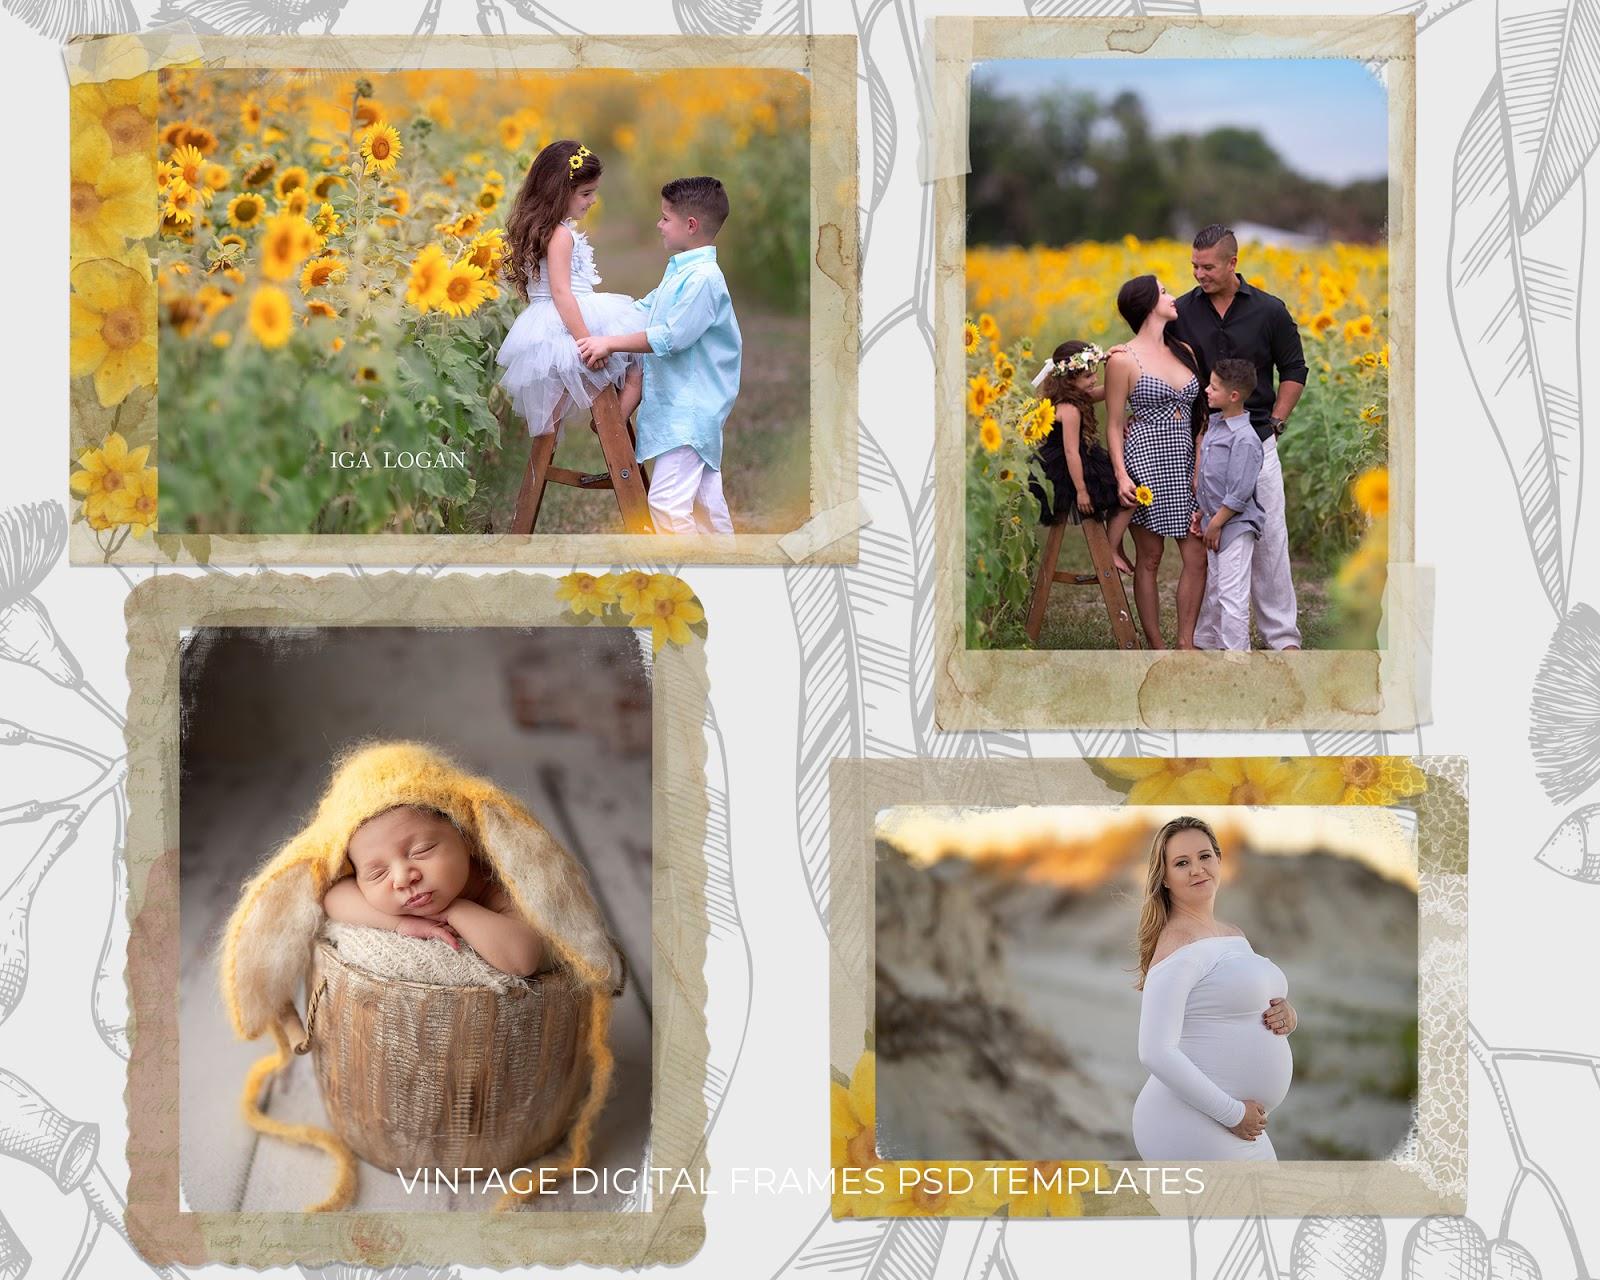 https://1.bp.blogspot.com/-VzELtYix_wE/XOVjLMCafqI/AAAAAAAAE7A/alHHYoc7dWwY4IVmBXounoqiuTiXfVWnQCLcBGAs/s1600/Vintage%2BDigital%2BFrames%2Bfor%2BPhotographers.jpg